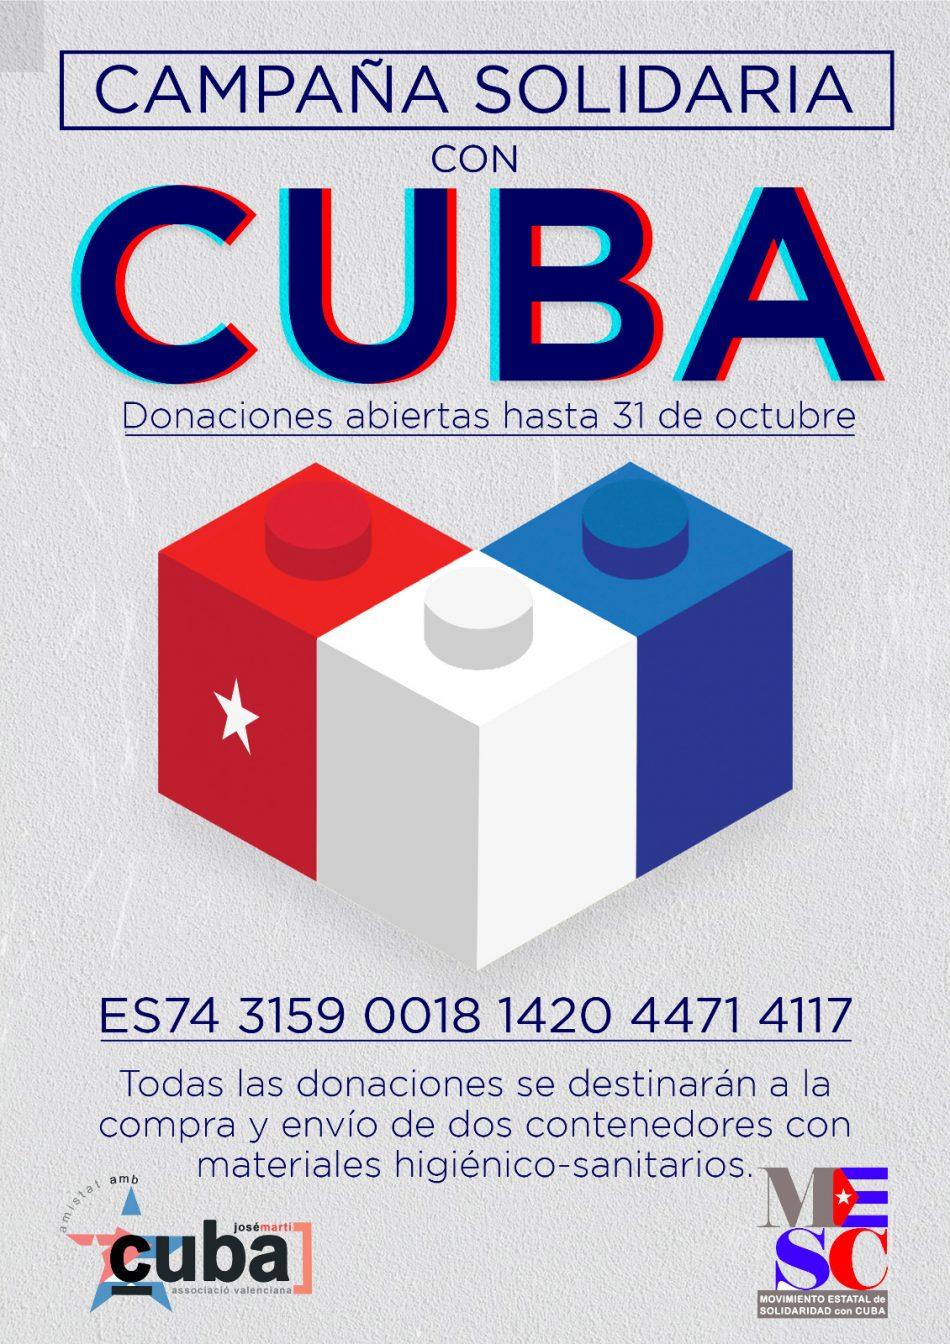 Lanzan una campaña solidaria para enviar dos contendores con material sanitario a Cuba desde Valencia